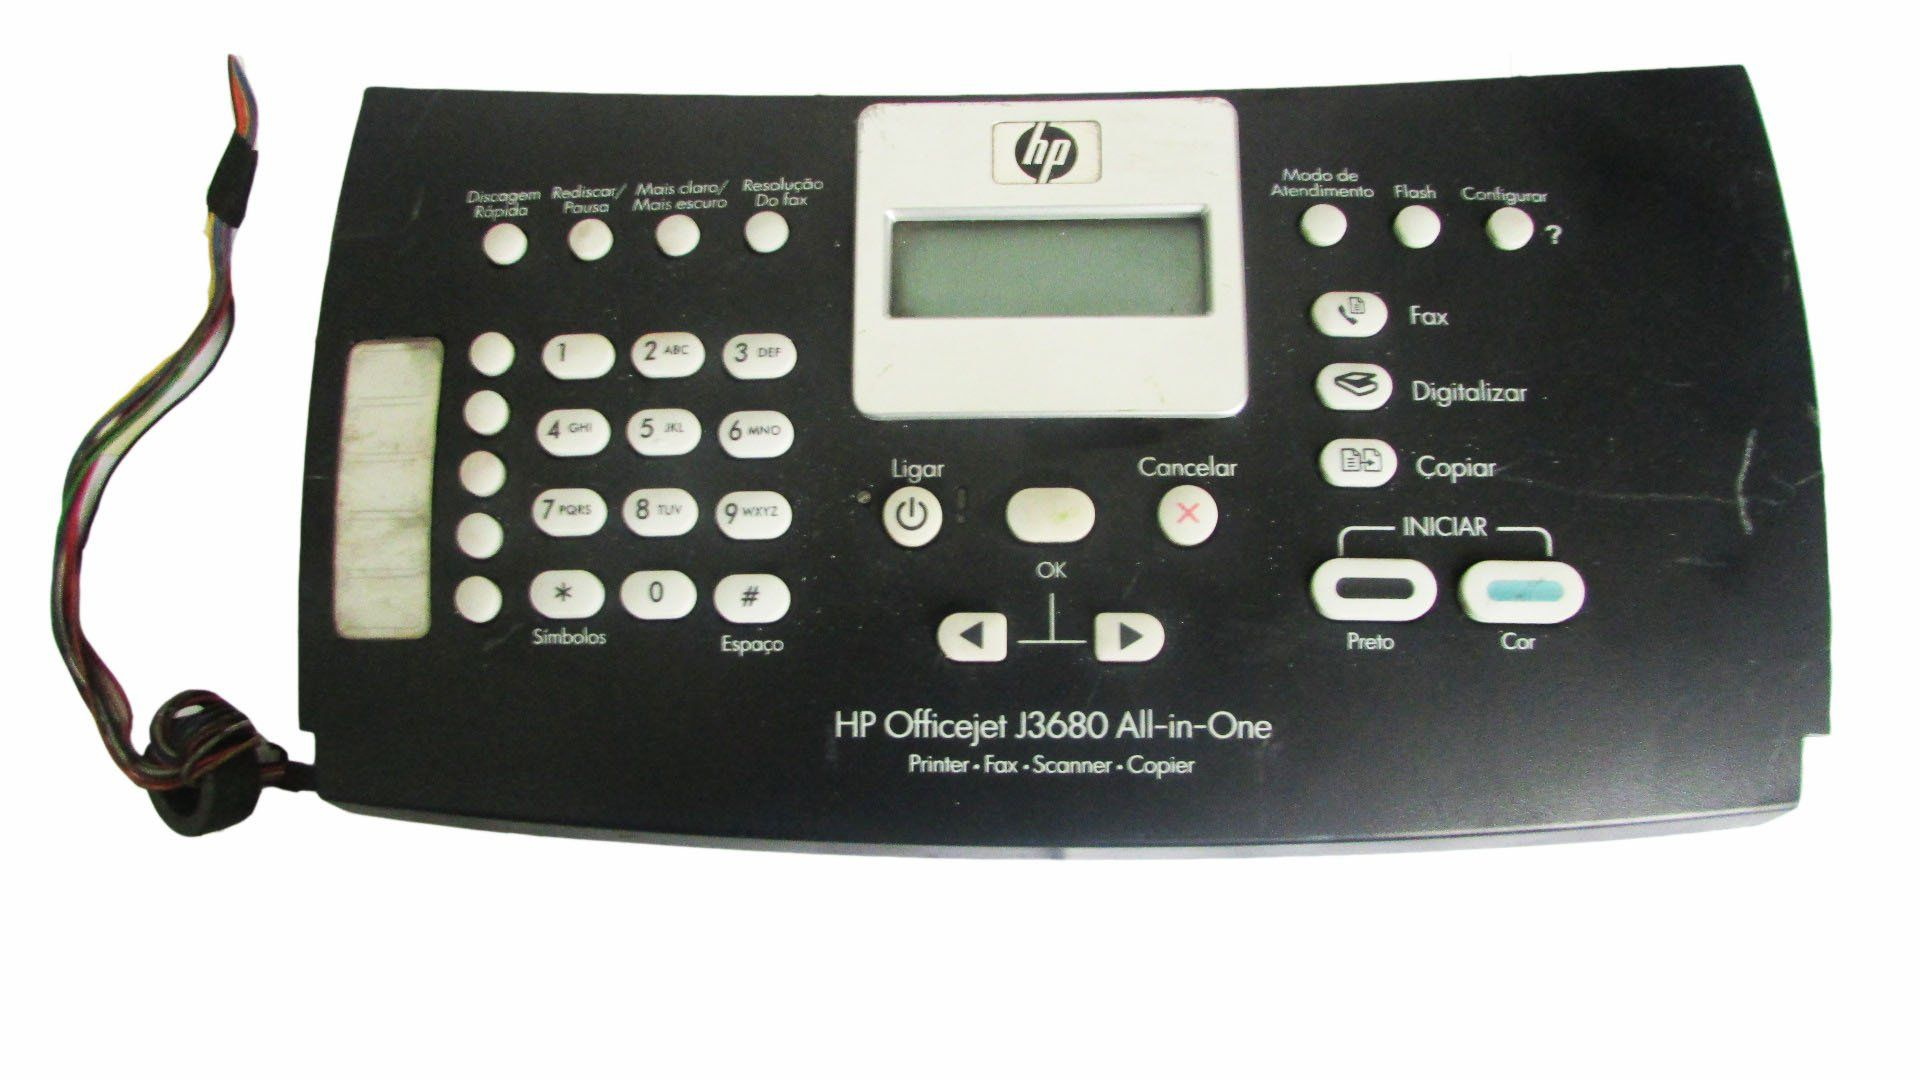 Painel Completo Original Impressora Hp Officejet J3680 (semi novo)